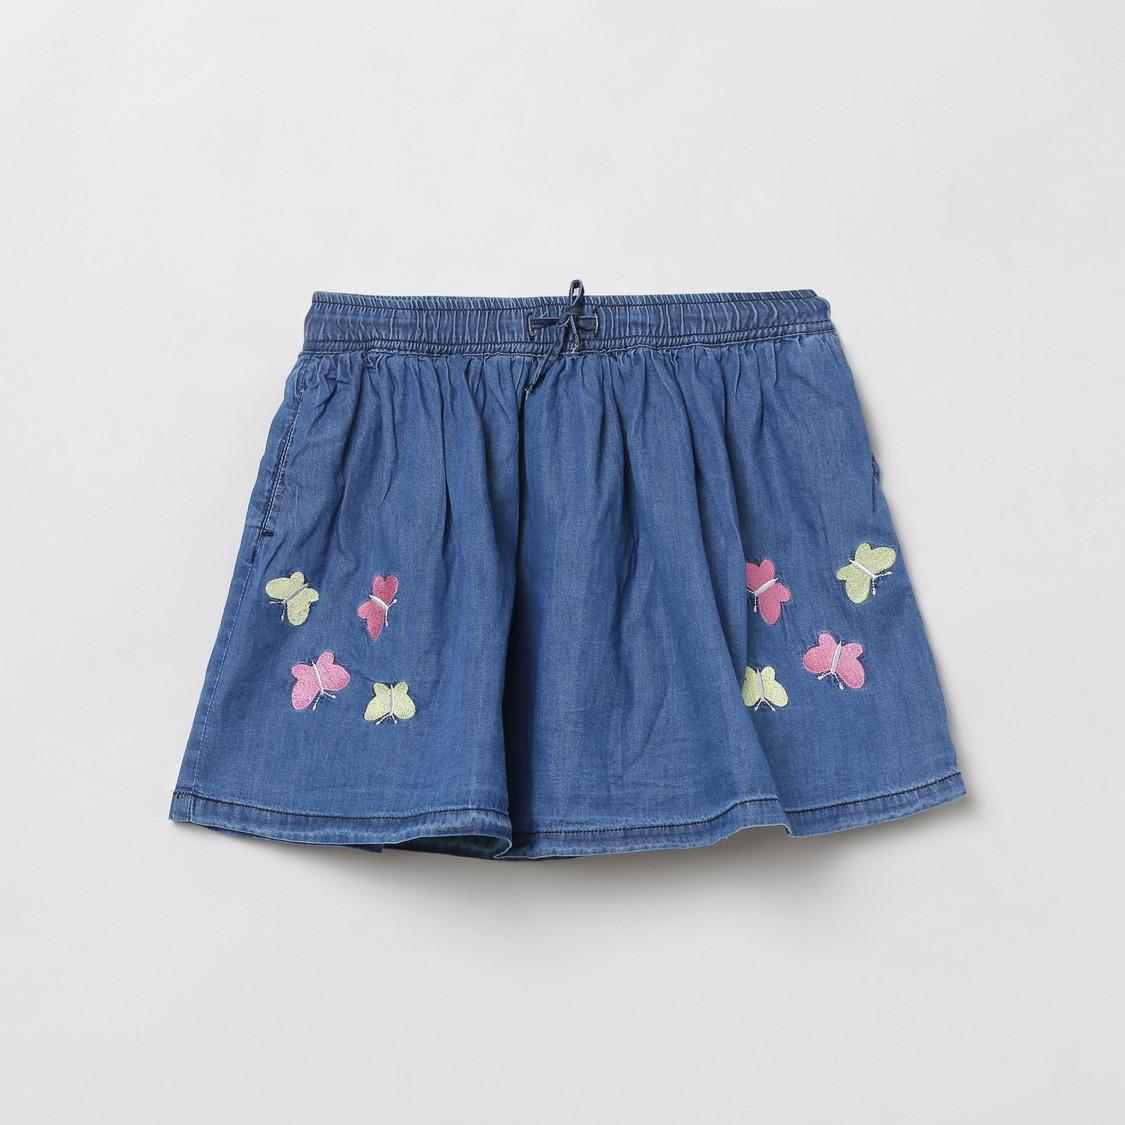 MAX Embroidered Elasticated Denim Skirt